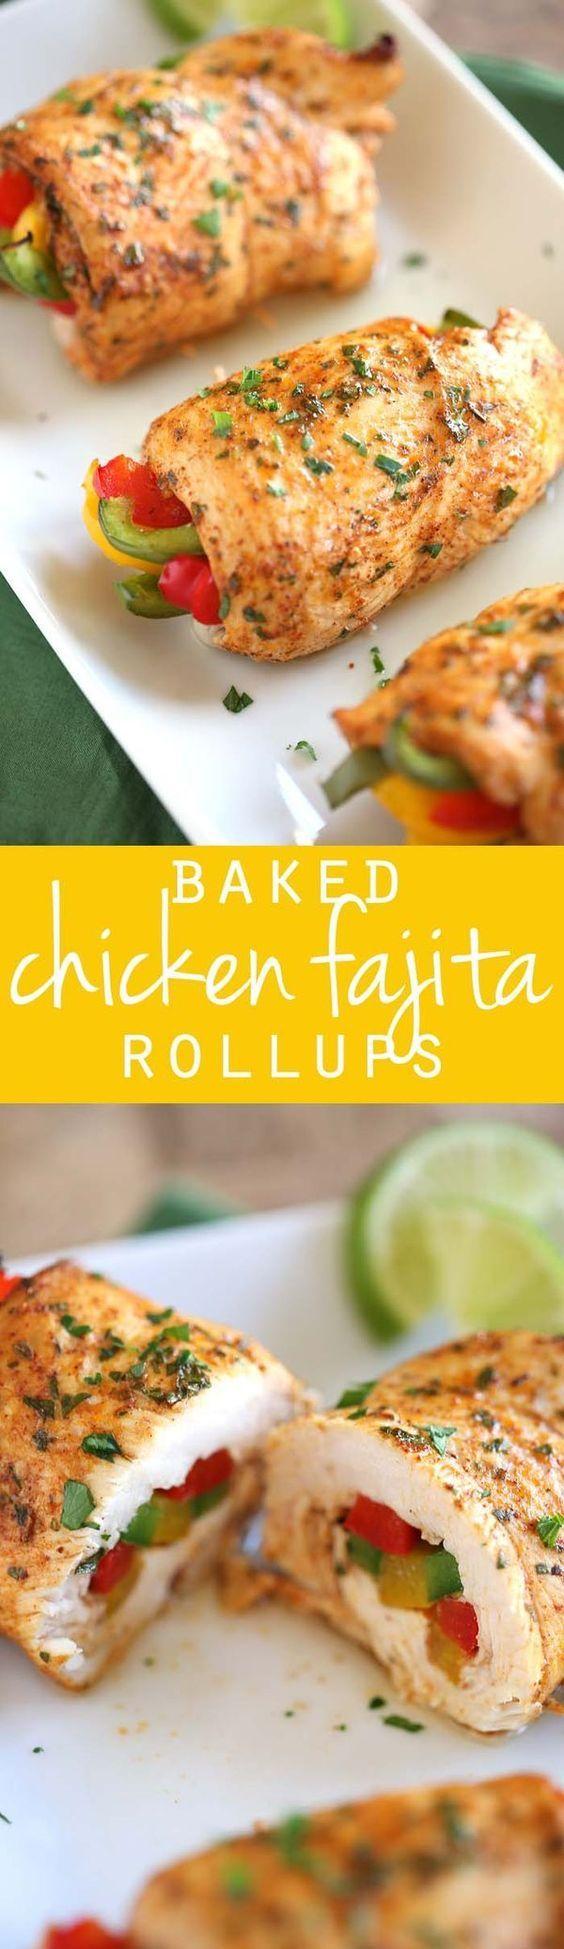 Chicken Fajita Roll-Ups | Jodeze Home and Garden